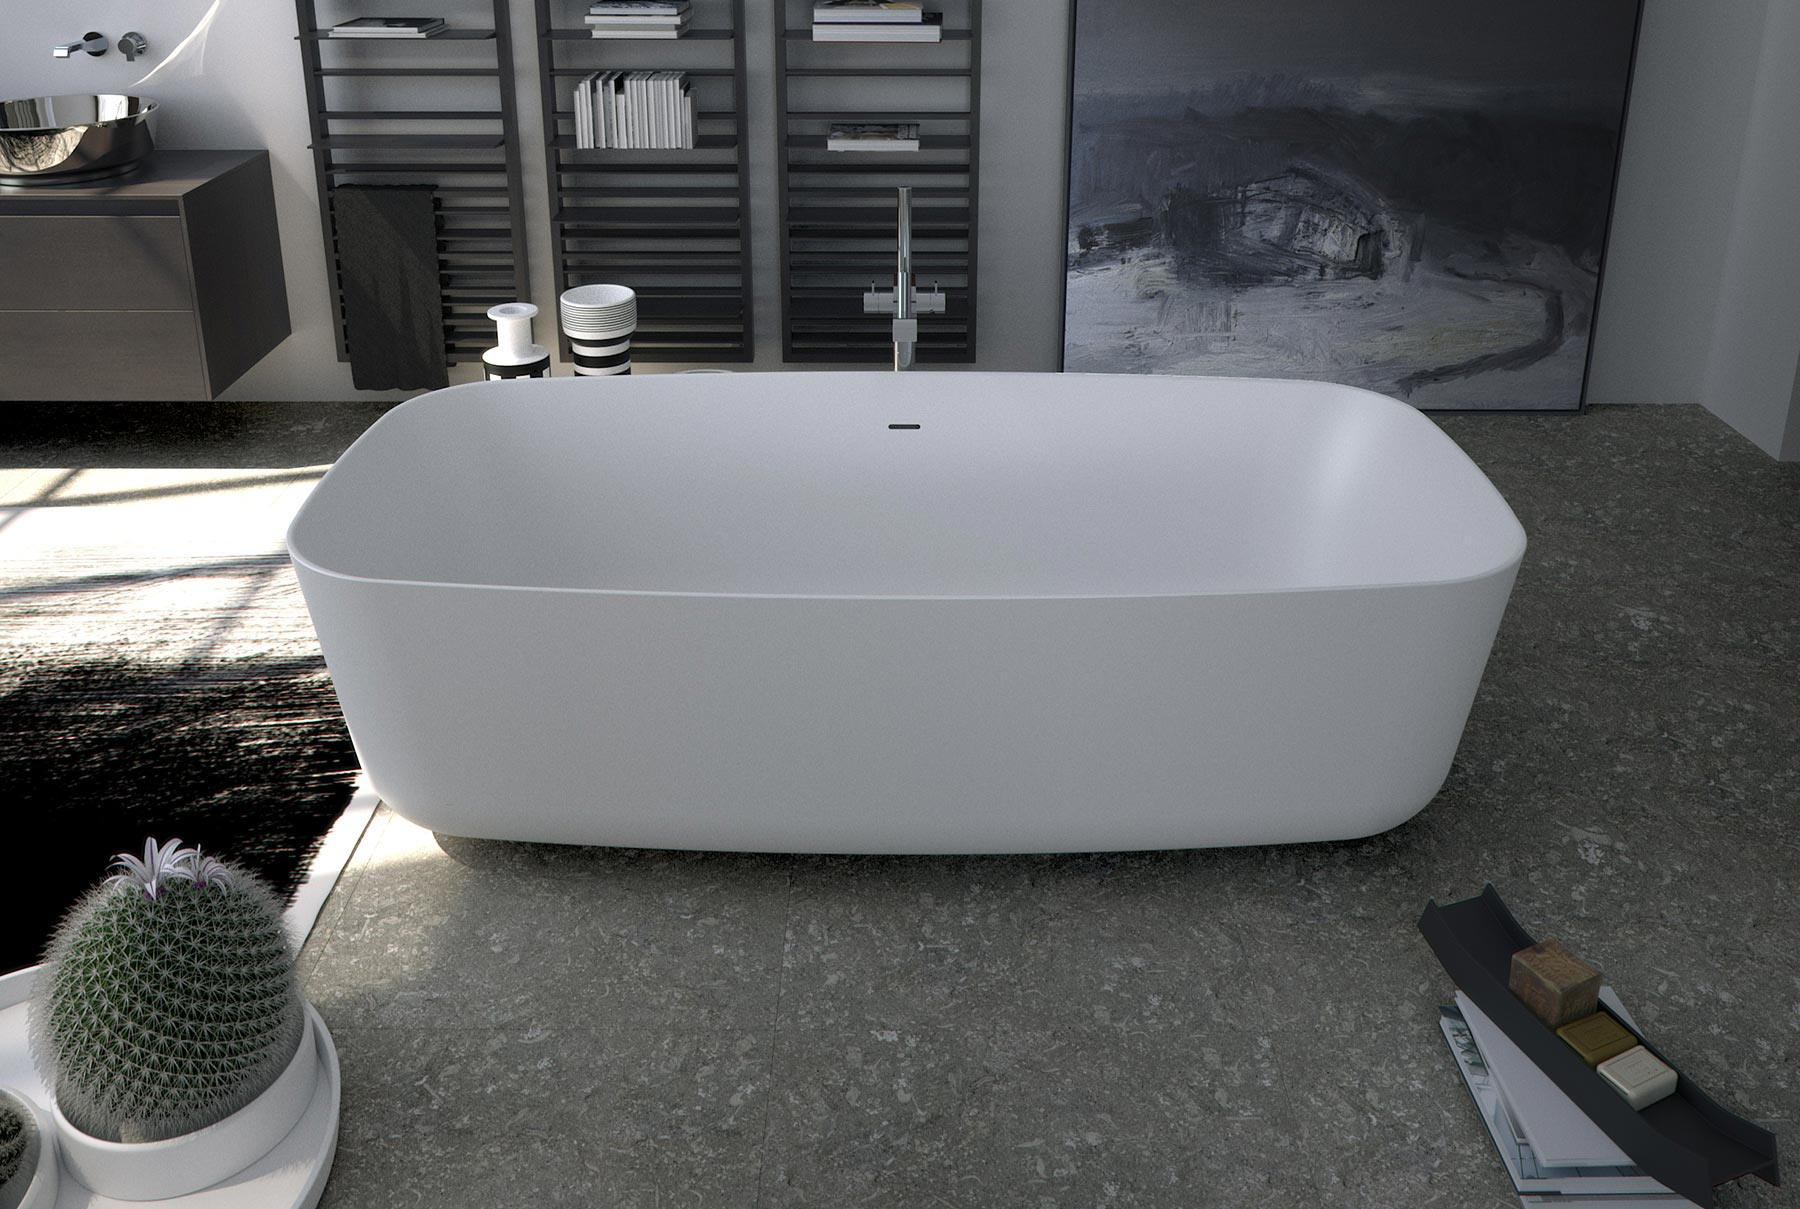 Vasche da bagno roma vasca di design sanitari a prezzi - Vasche da bagno roma ...